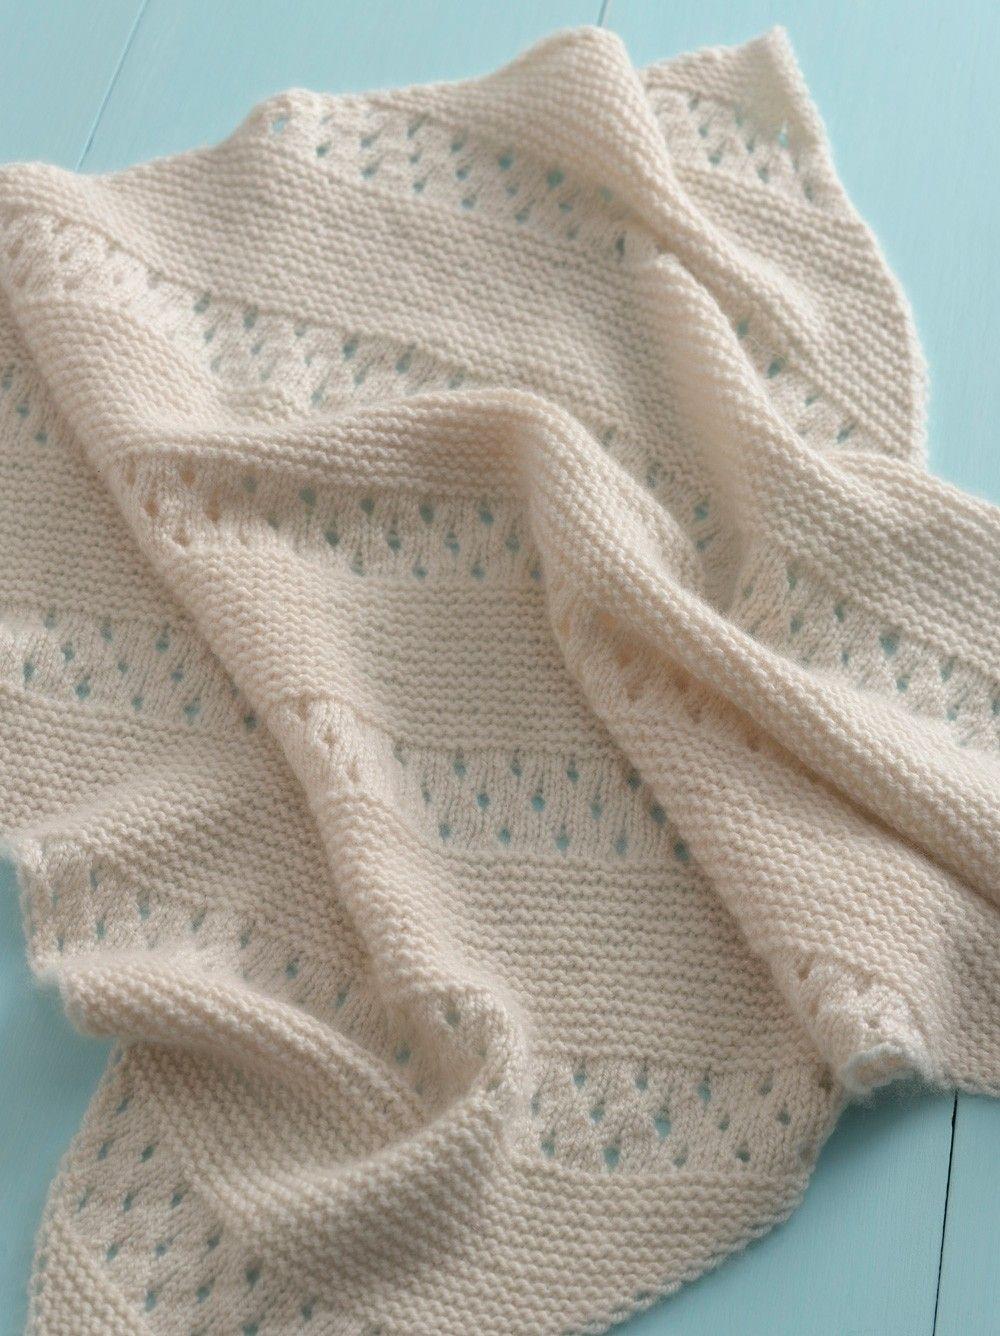 Treasured Heirloom Baby Blanket Pattern (Knit) | Tricot | Pinterest ...